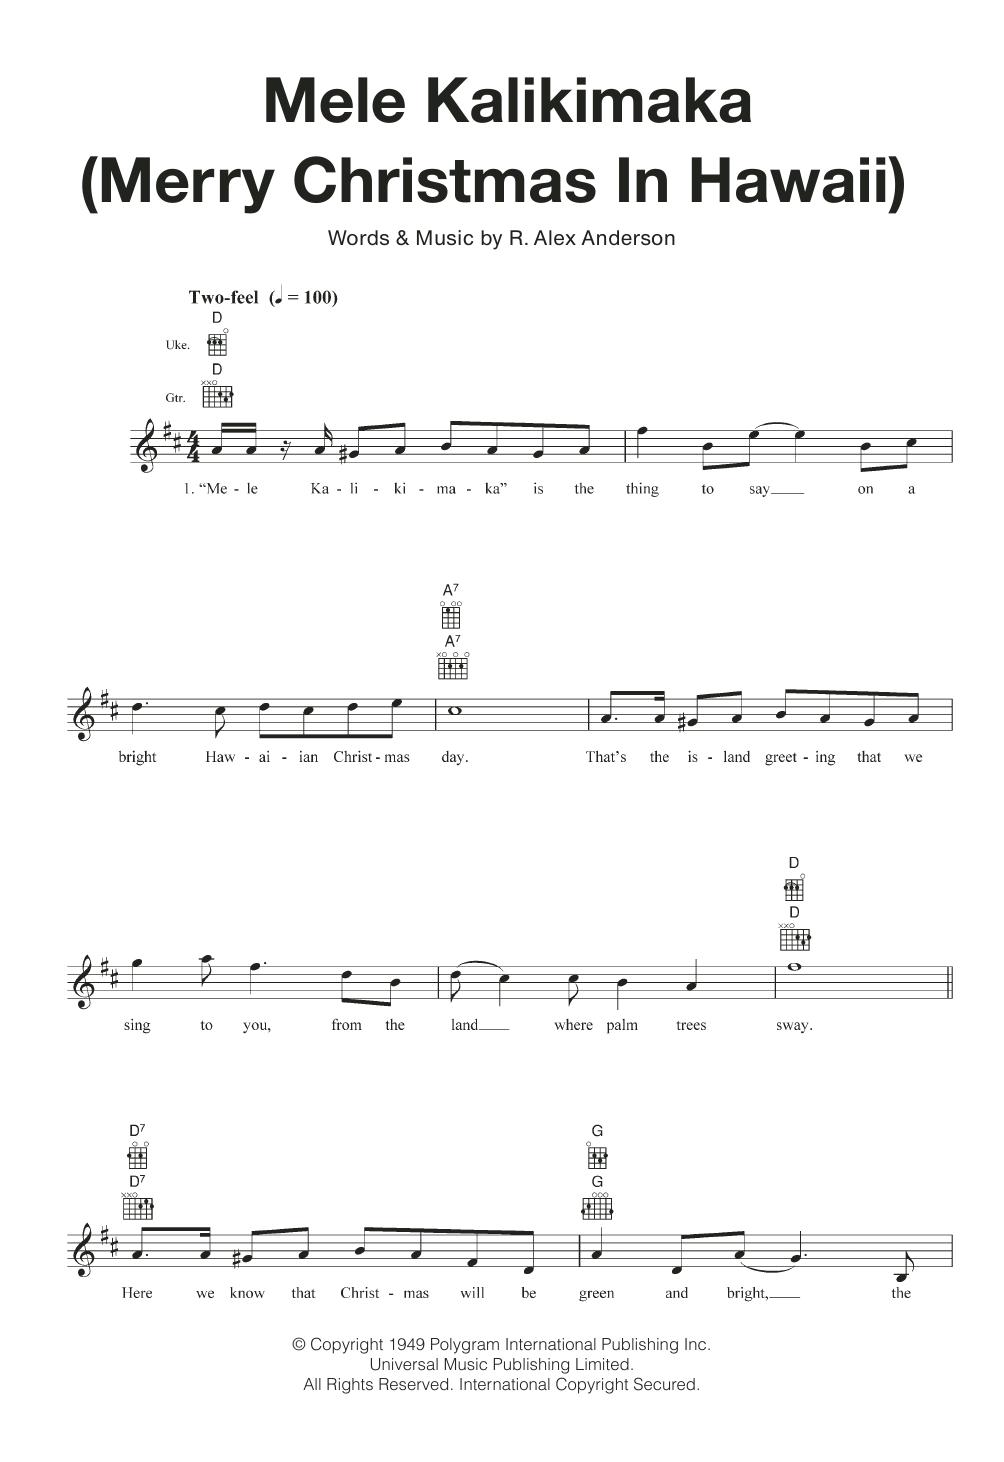 mele kalikimaka merry christmas in hawaii sheet music - Hawaiian Merry Christmas Song